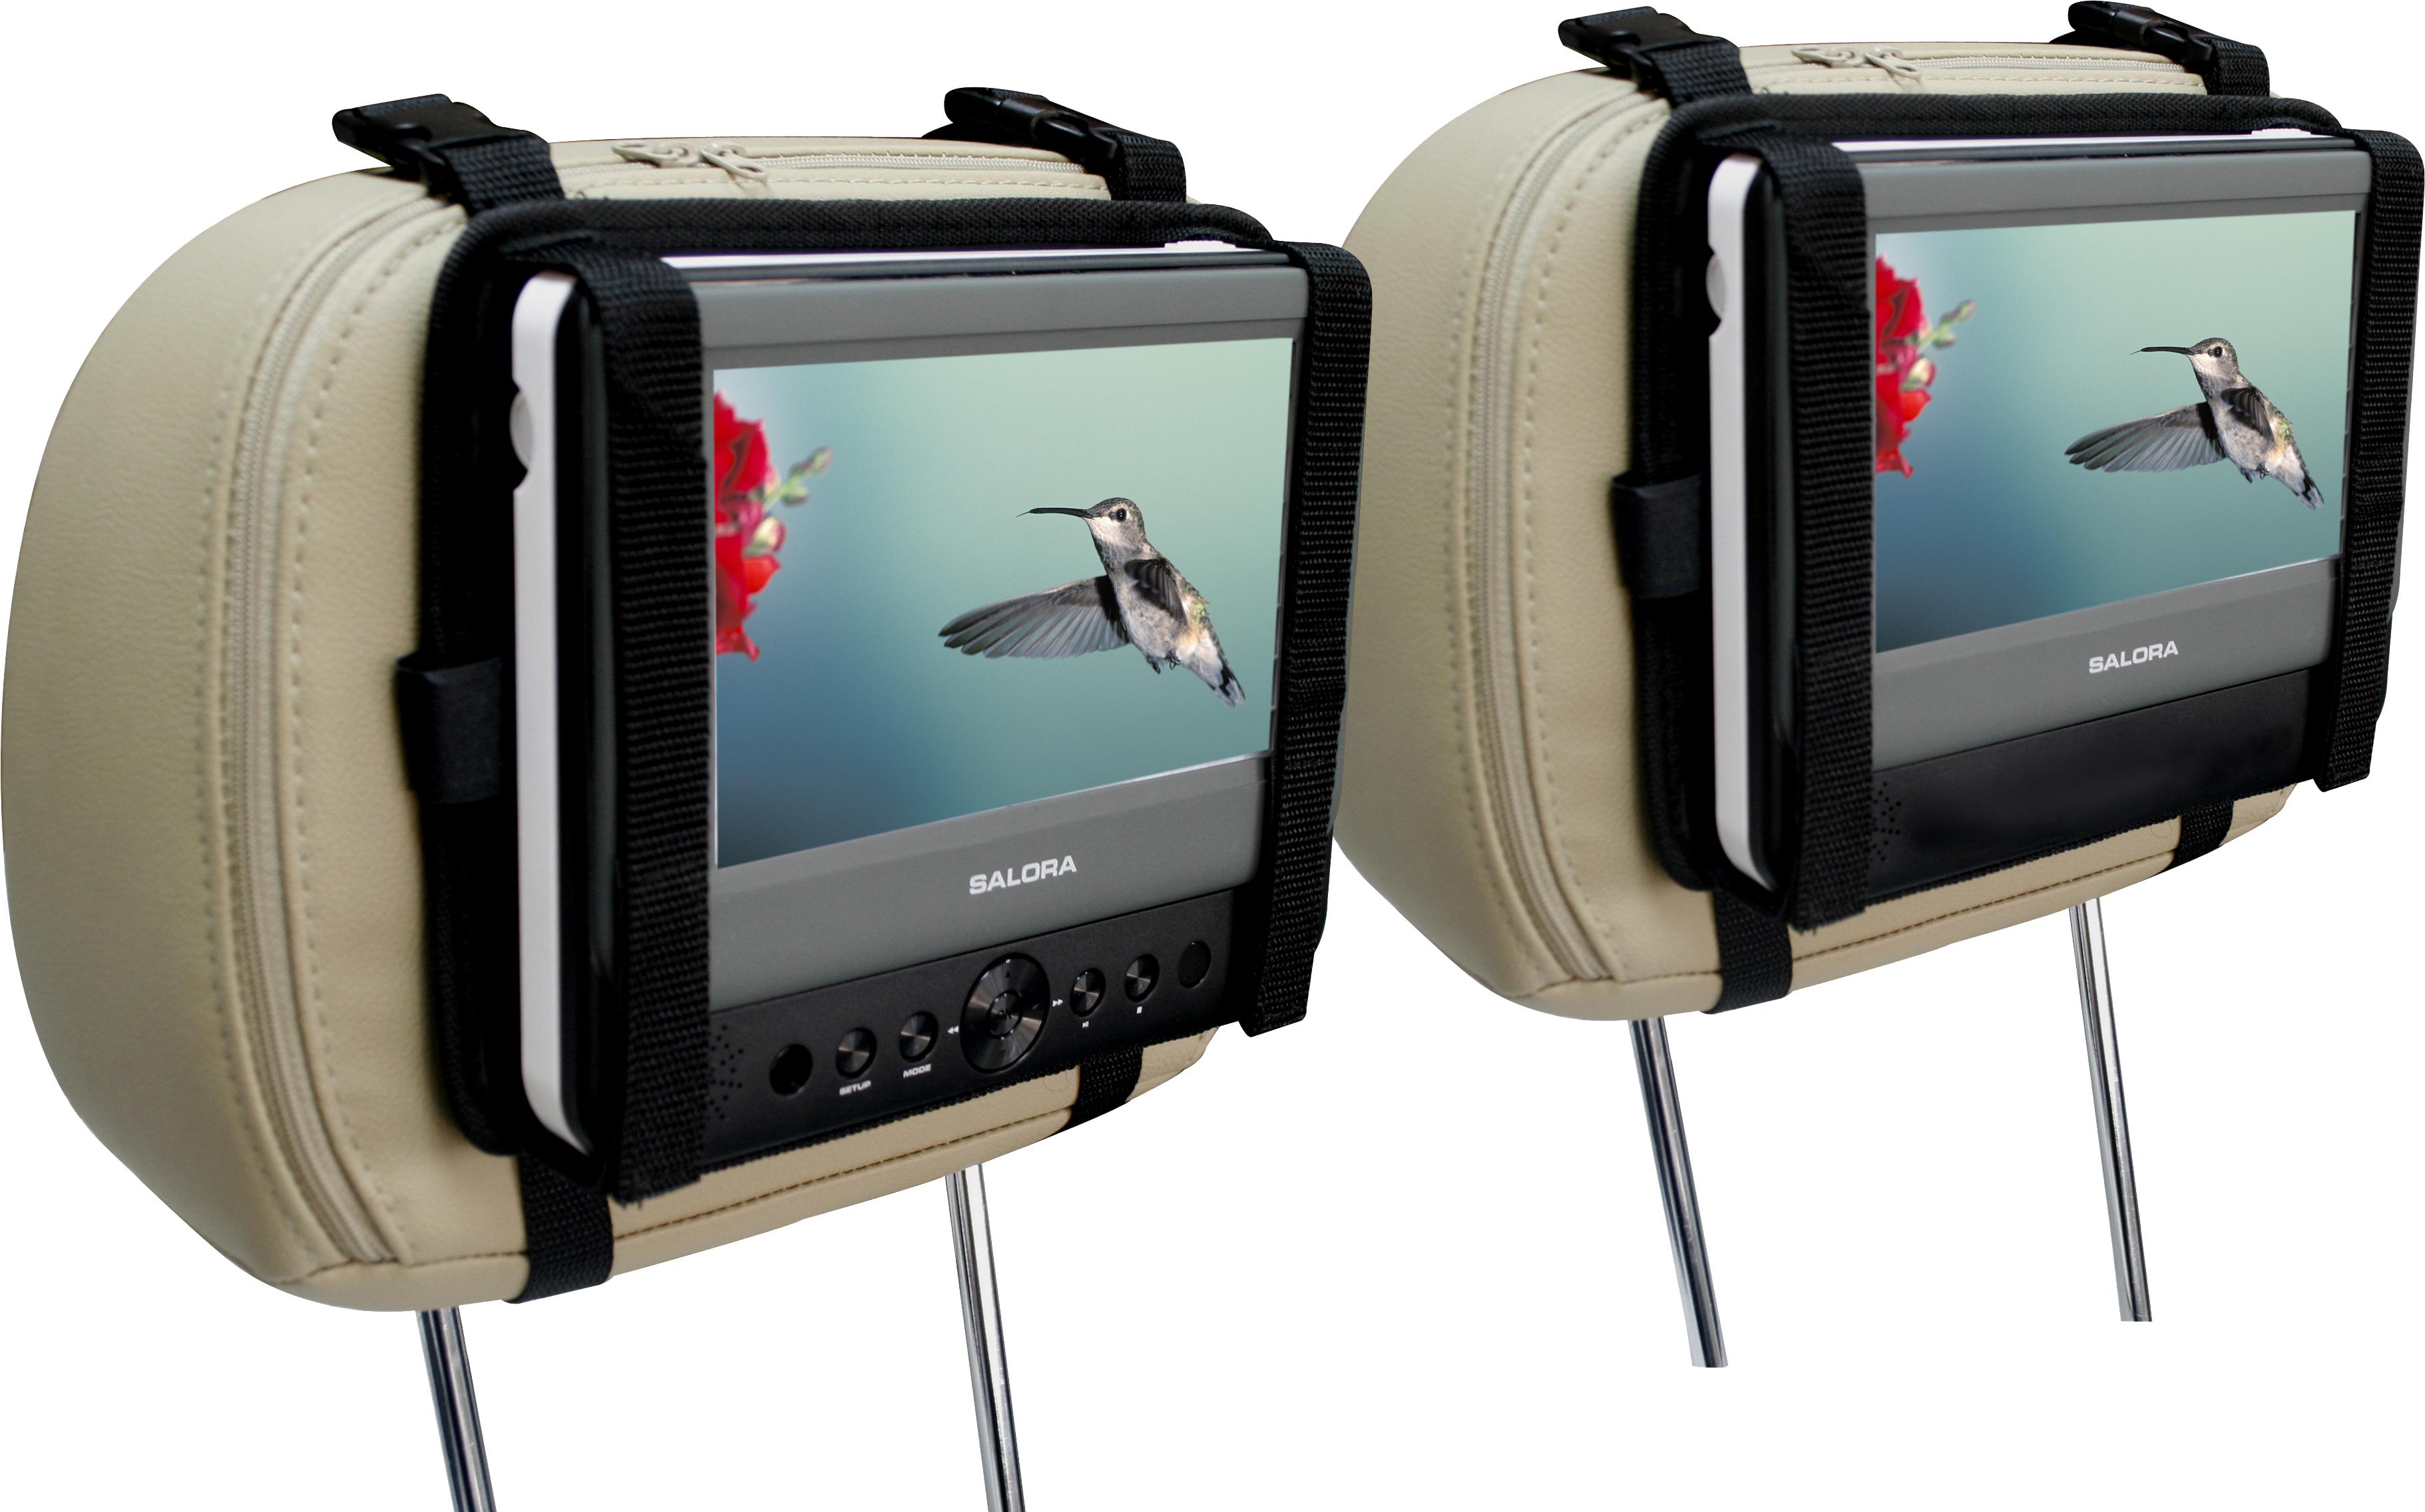 Salora DVP9048 TWIN OOB Demo Model